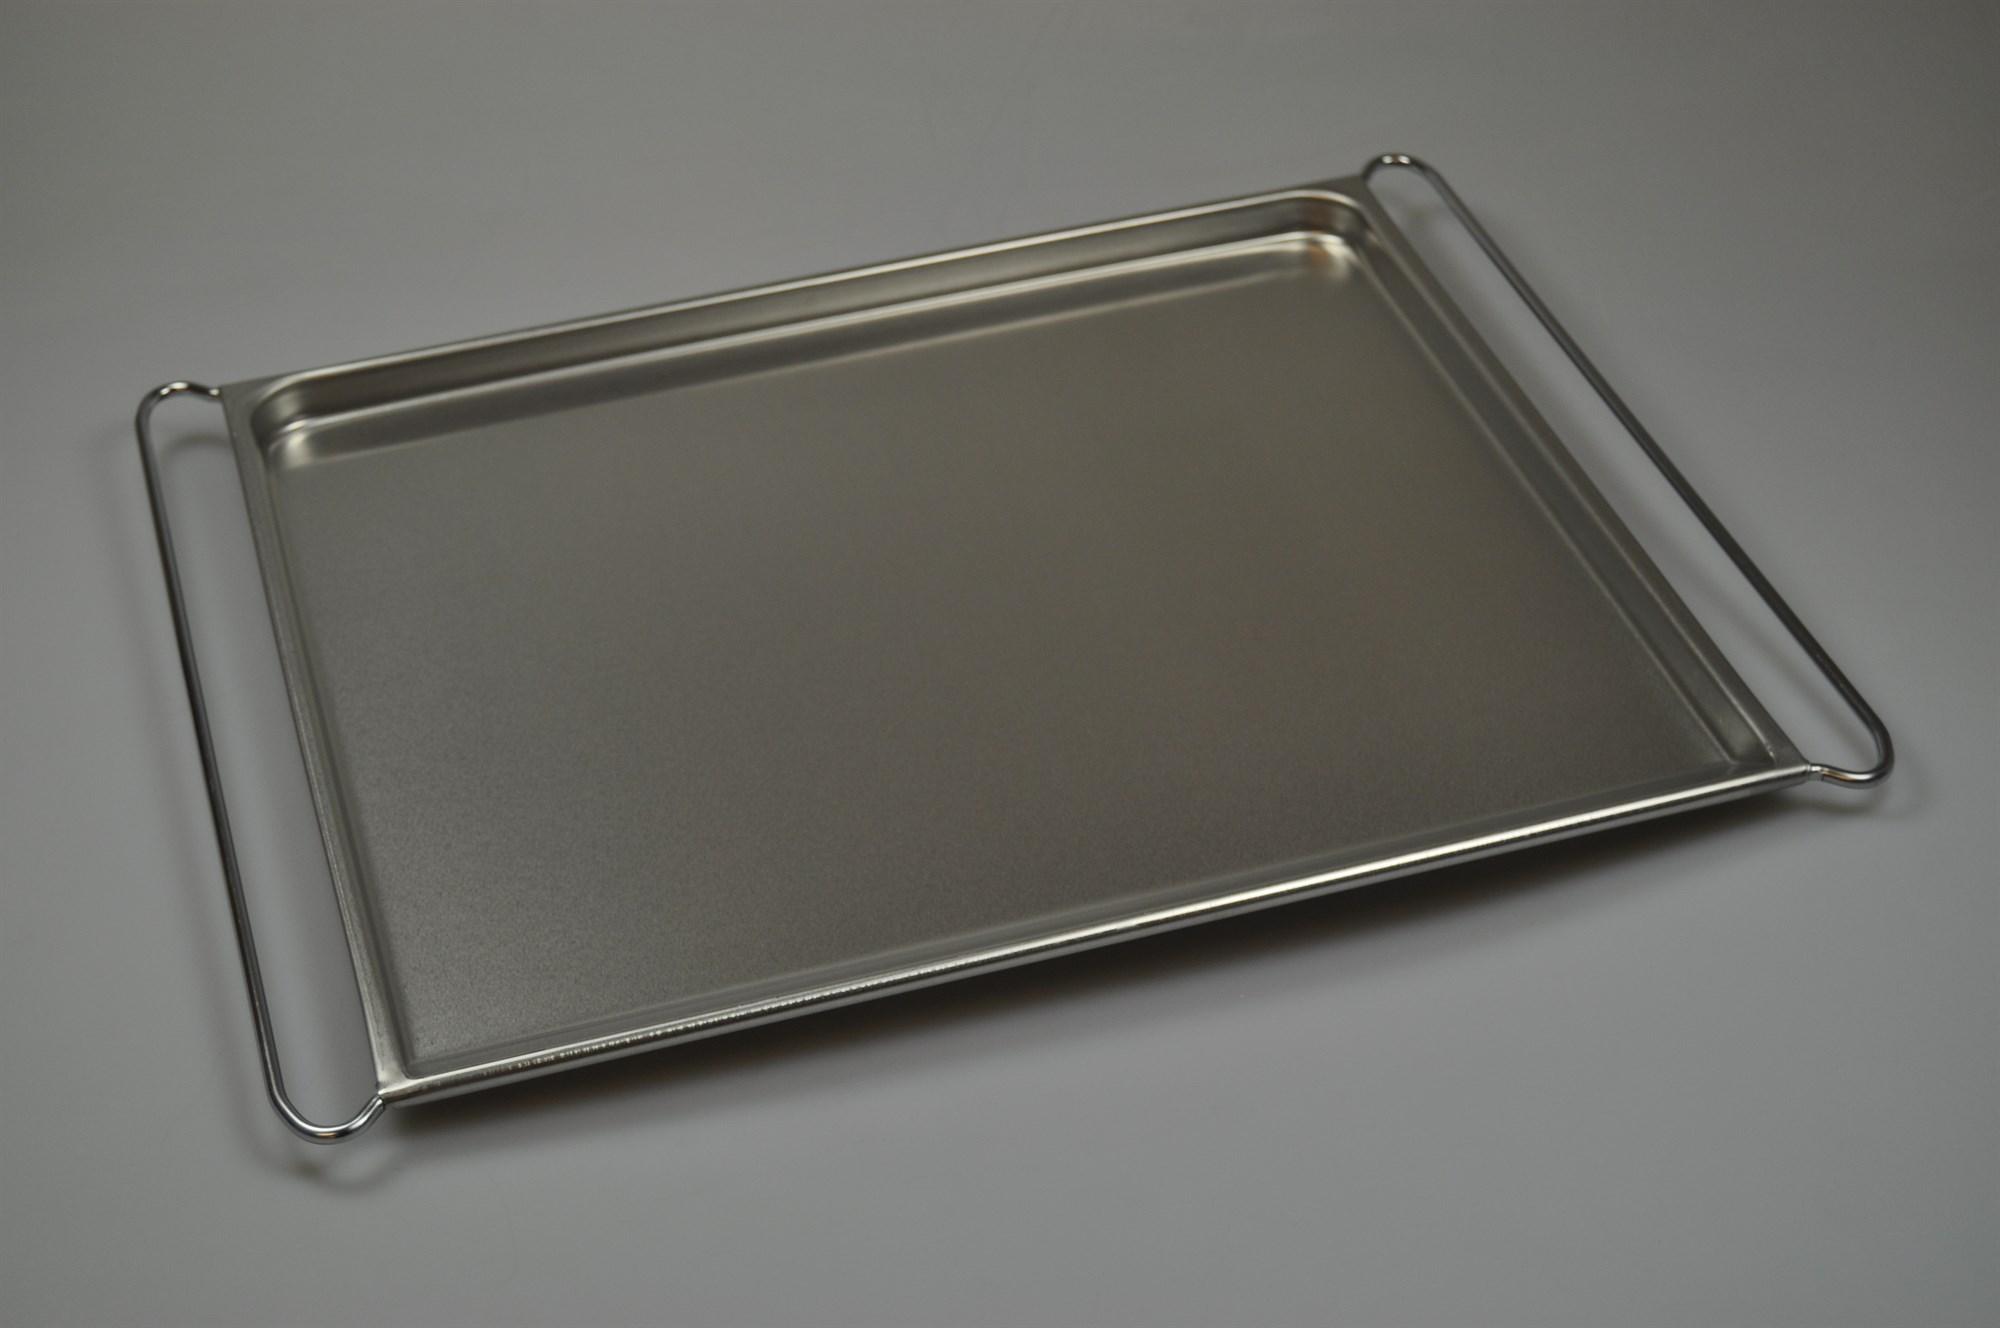 Baking Tray Bosch Cooker Amp Hob 19 Mm X 460 Mm X 365 Mm